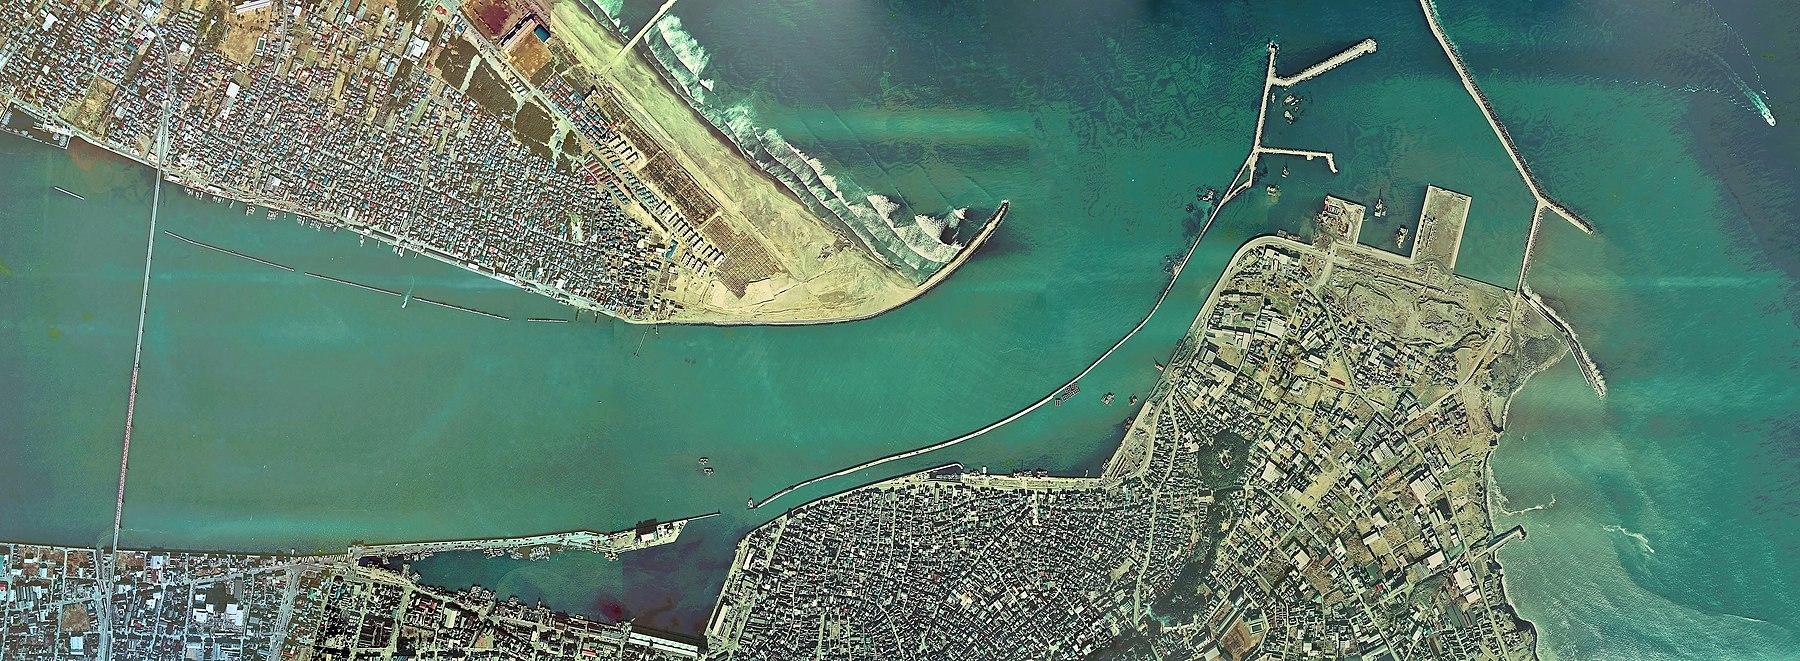 Estuary of Tone river Aerial photograph.1974.jpg